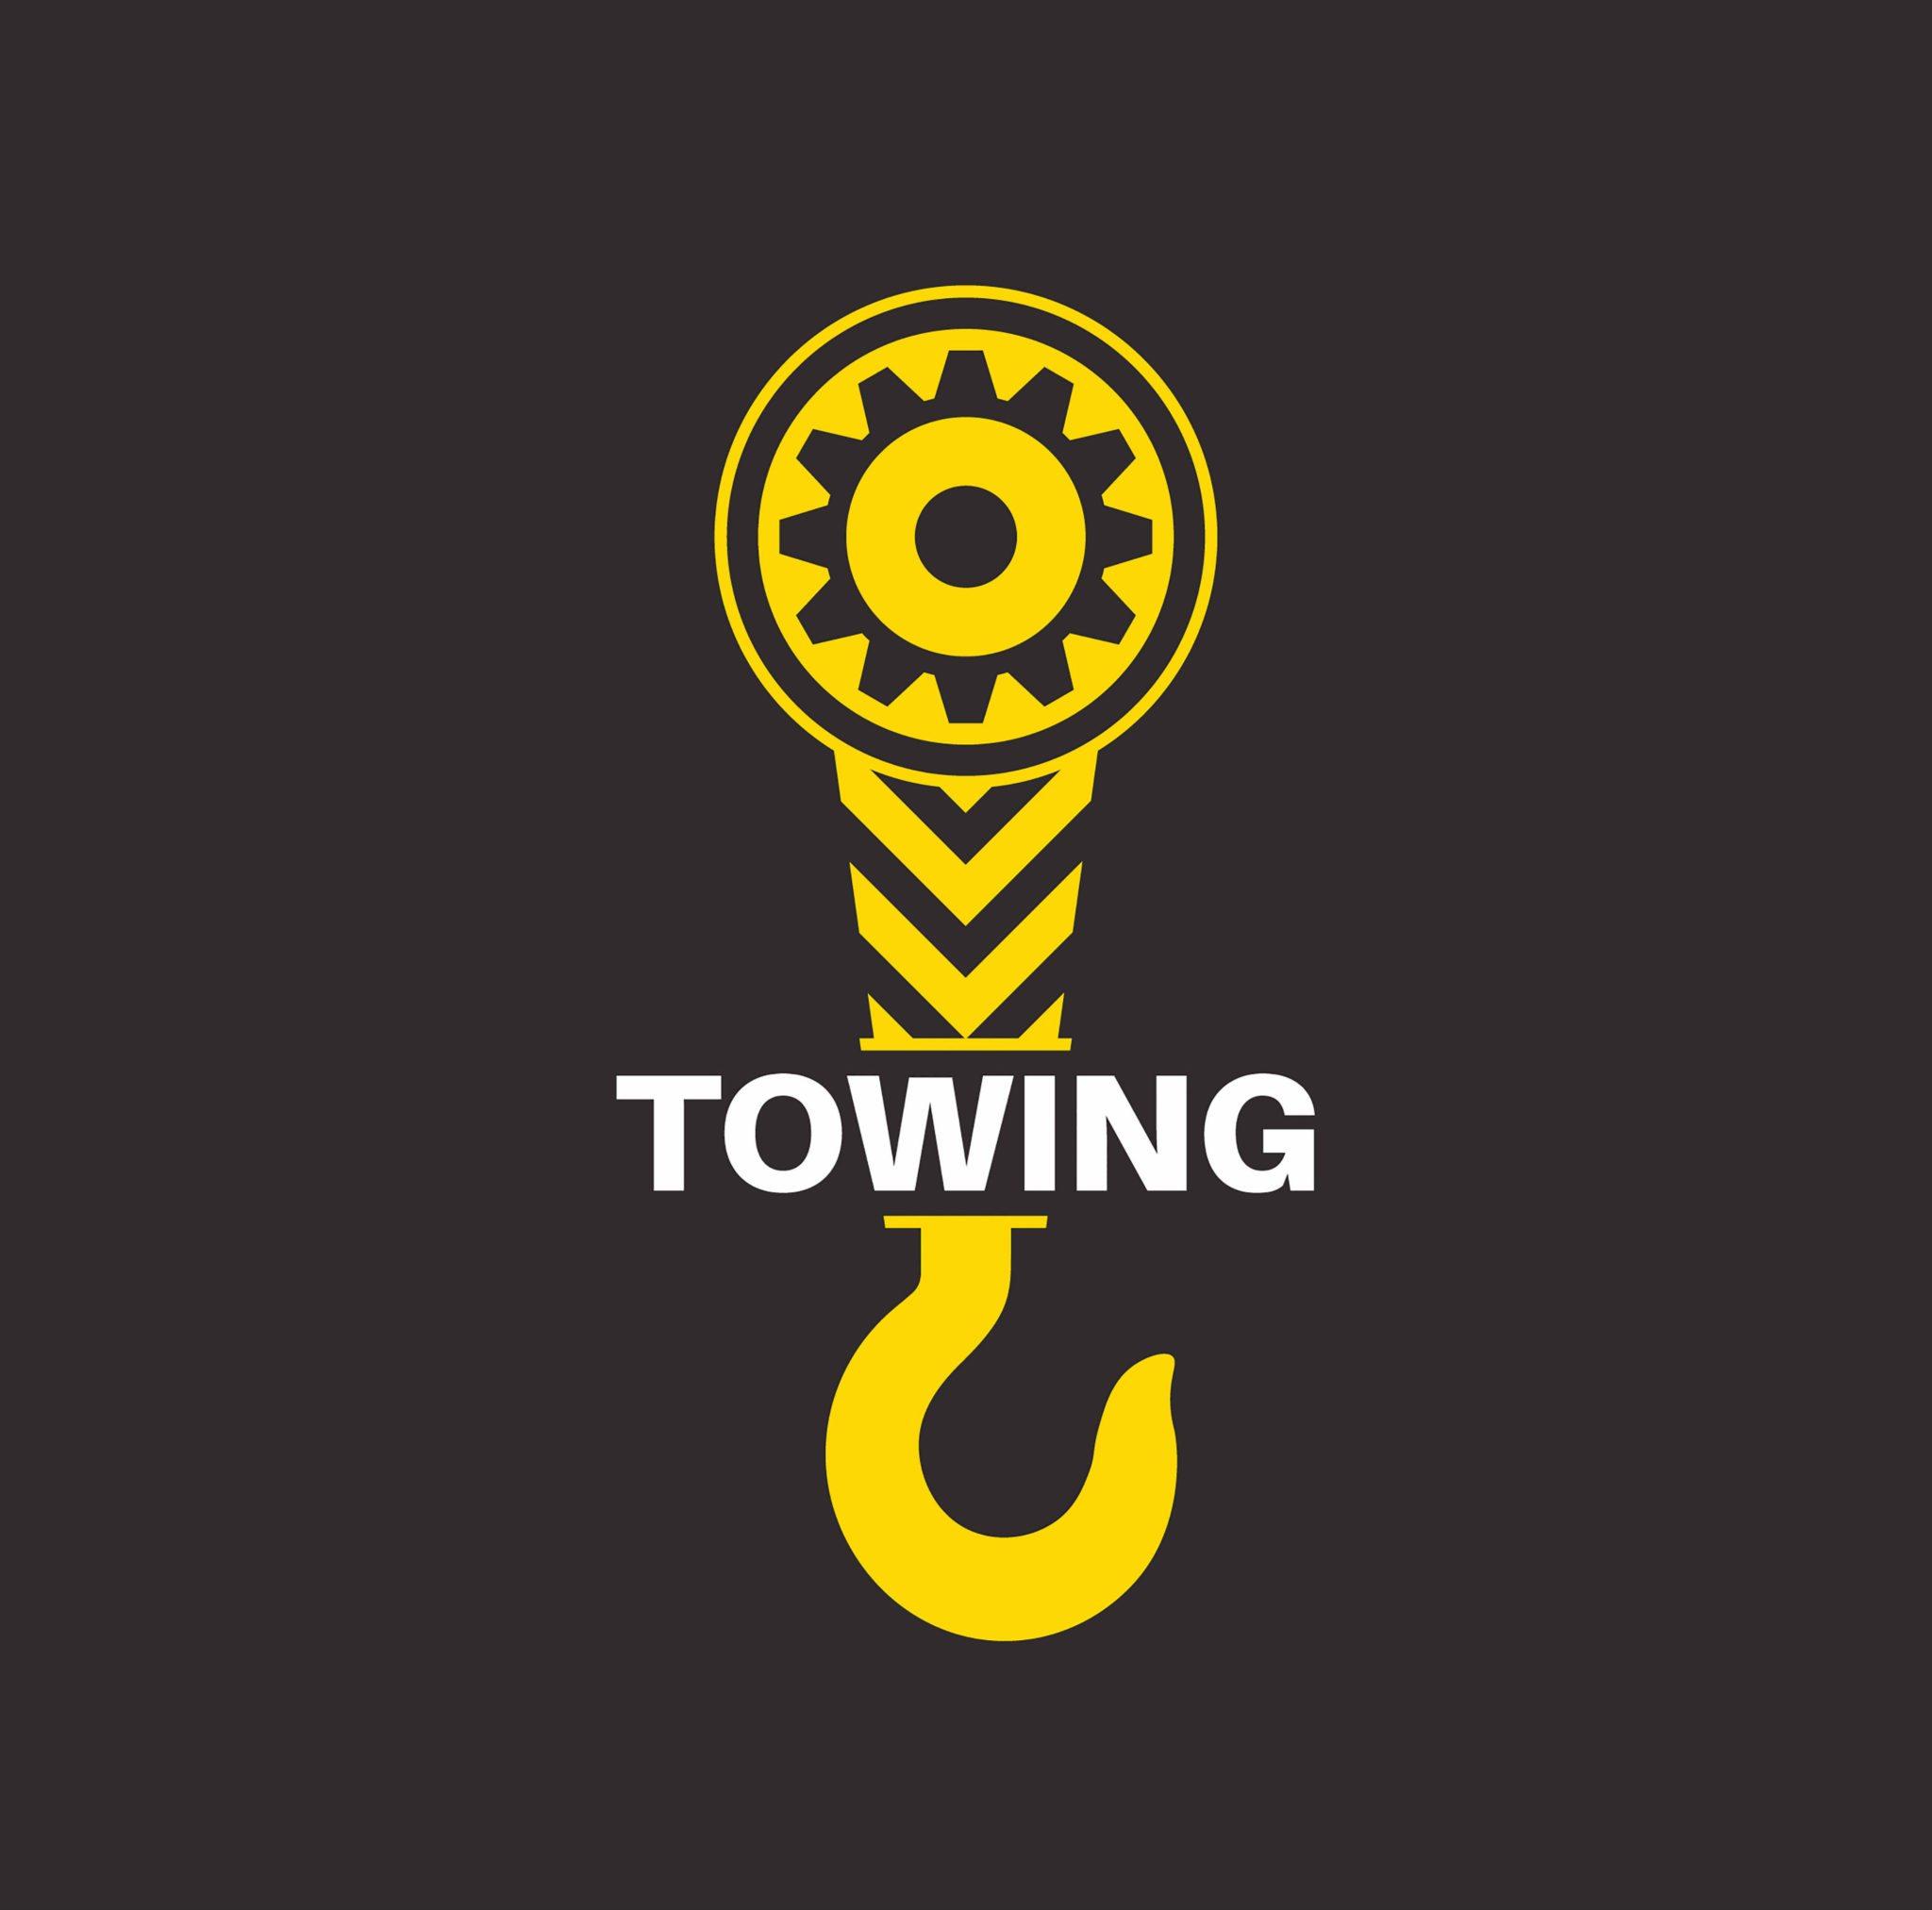 Eagle Towing Expert Tulsa Towing